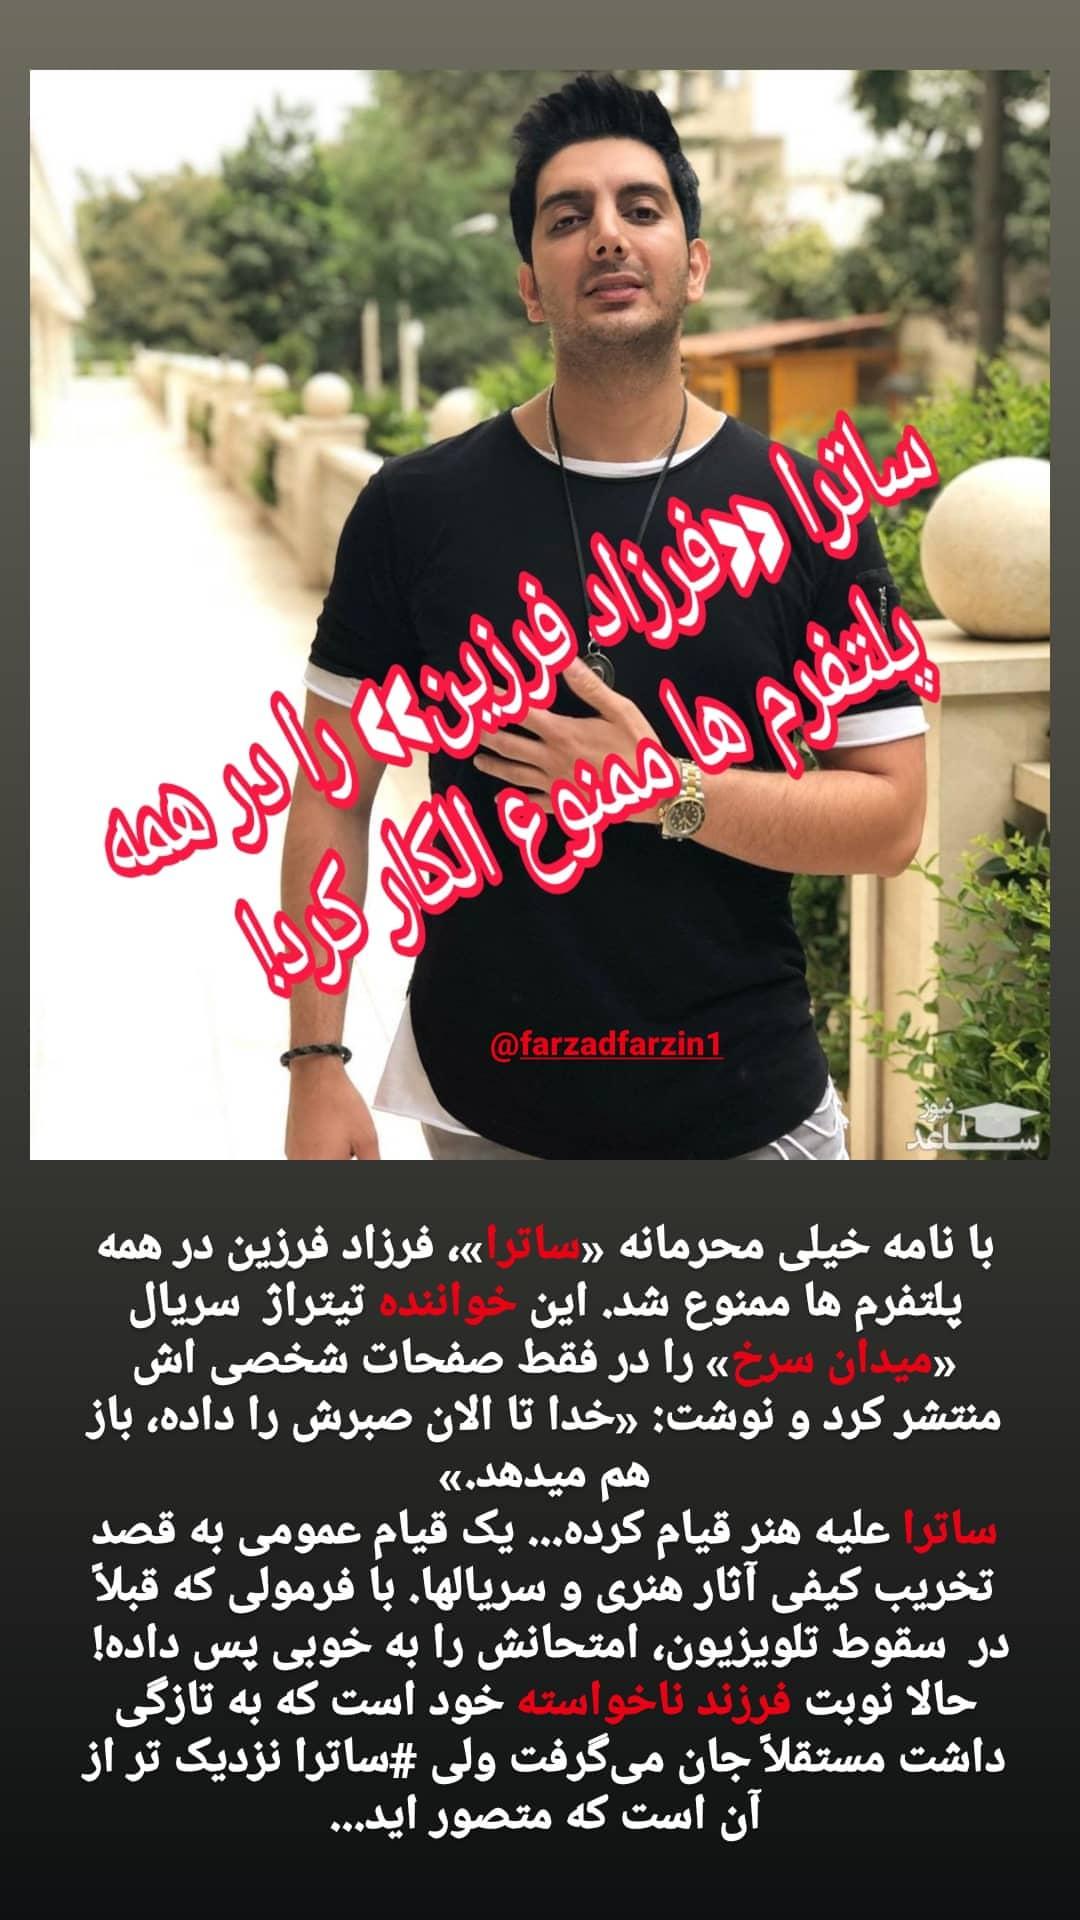 bahman_babazadeh_2620438228458524775_254123586